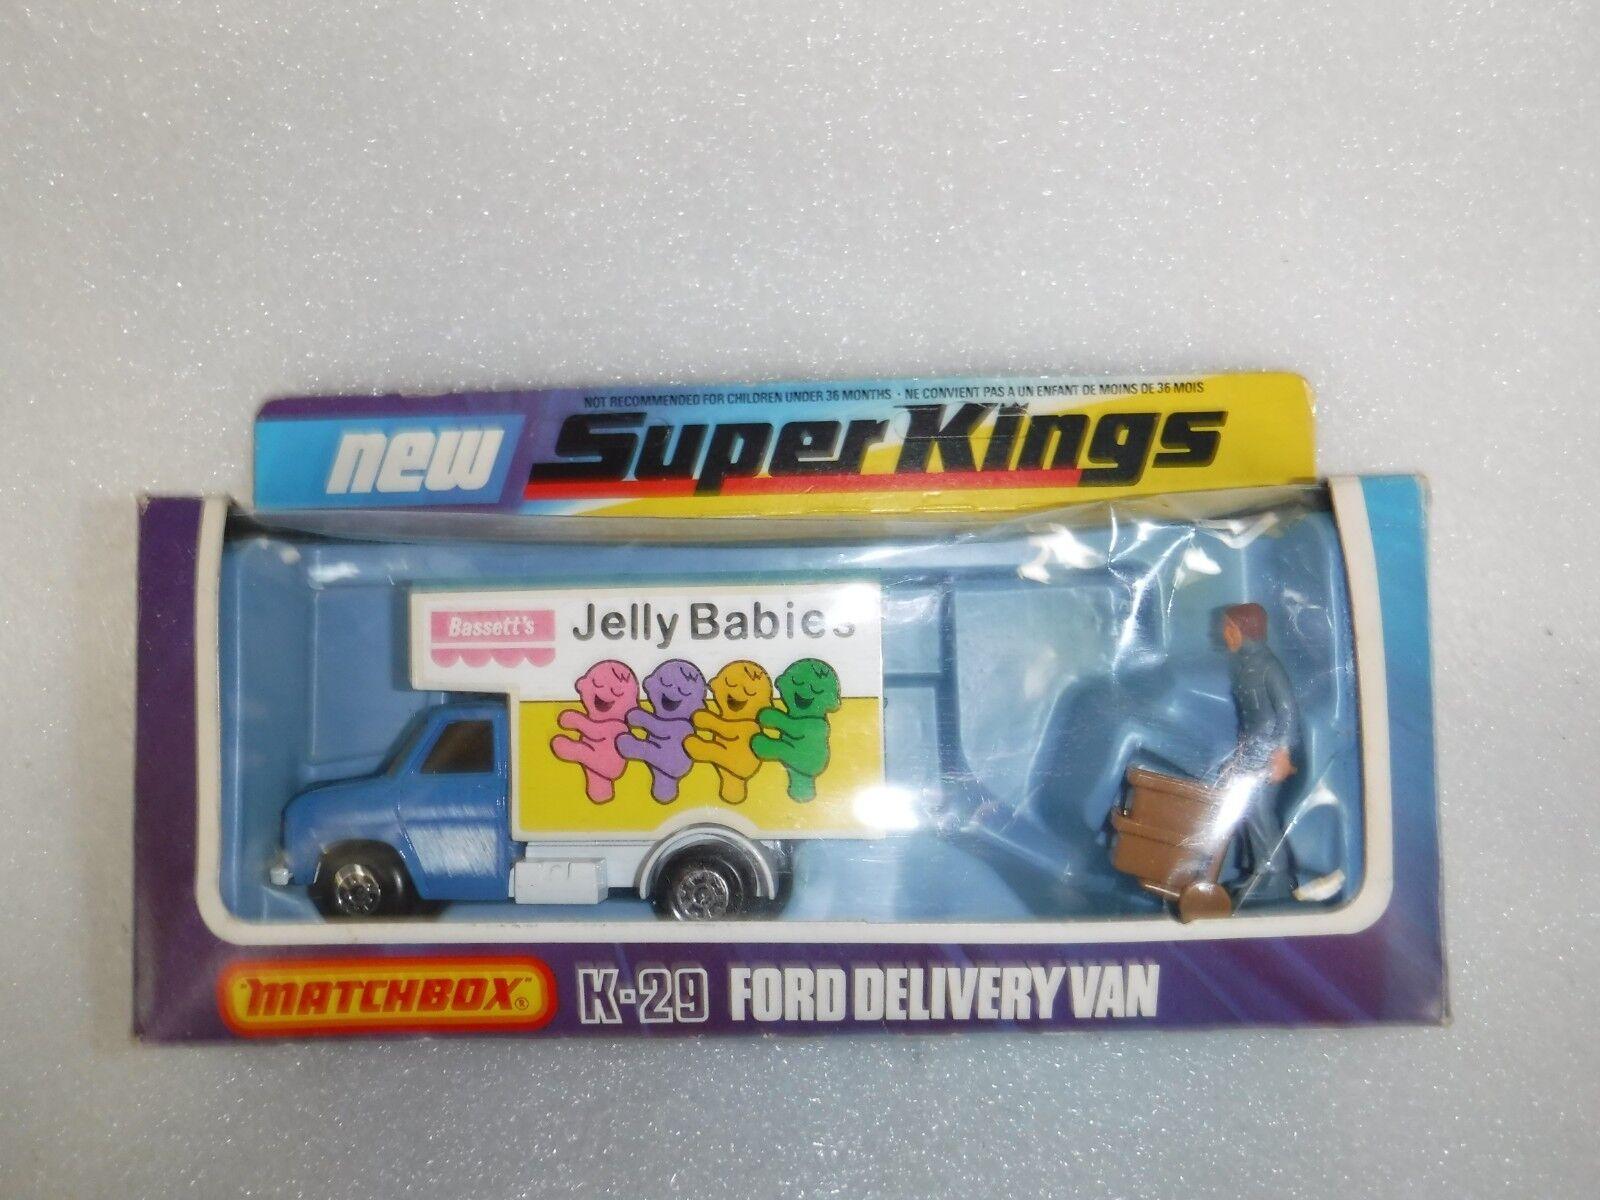 Vintage Matchbox Superkings K-29 K-29 K-29 Ford entrega van Bassetts bebés de gelatina, En Caja 9968f1